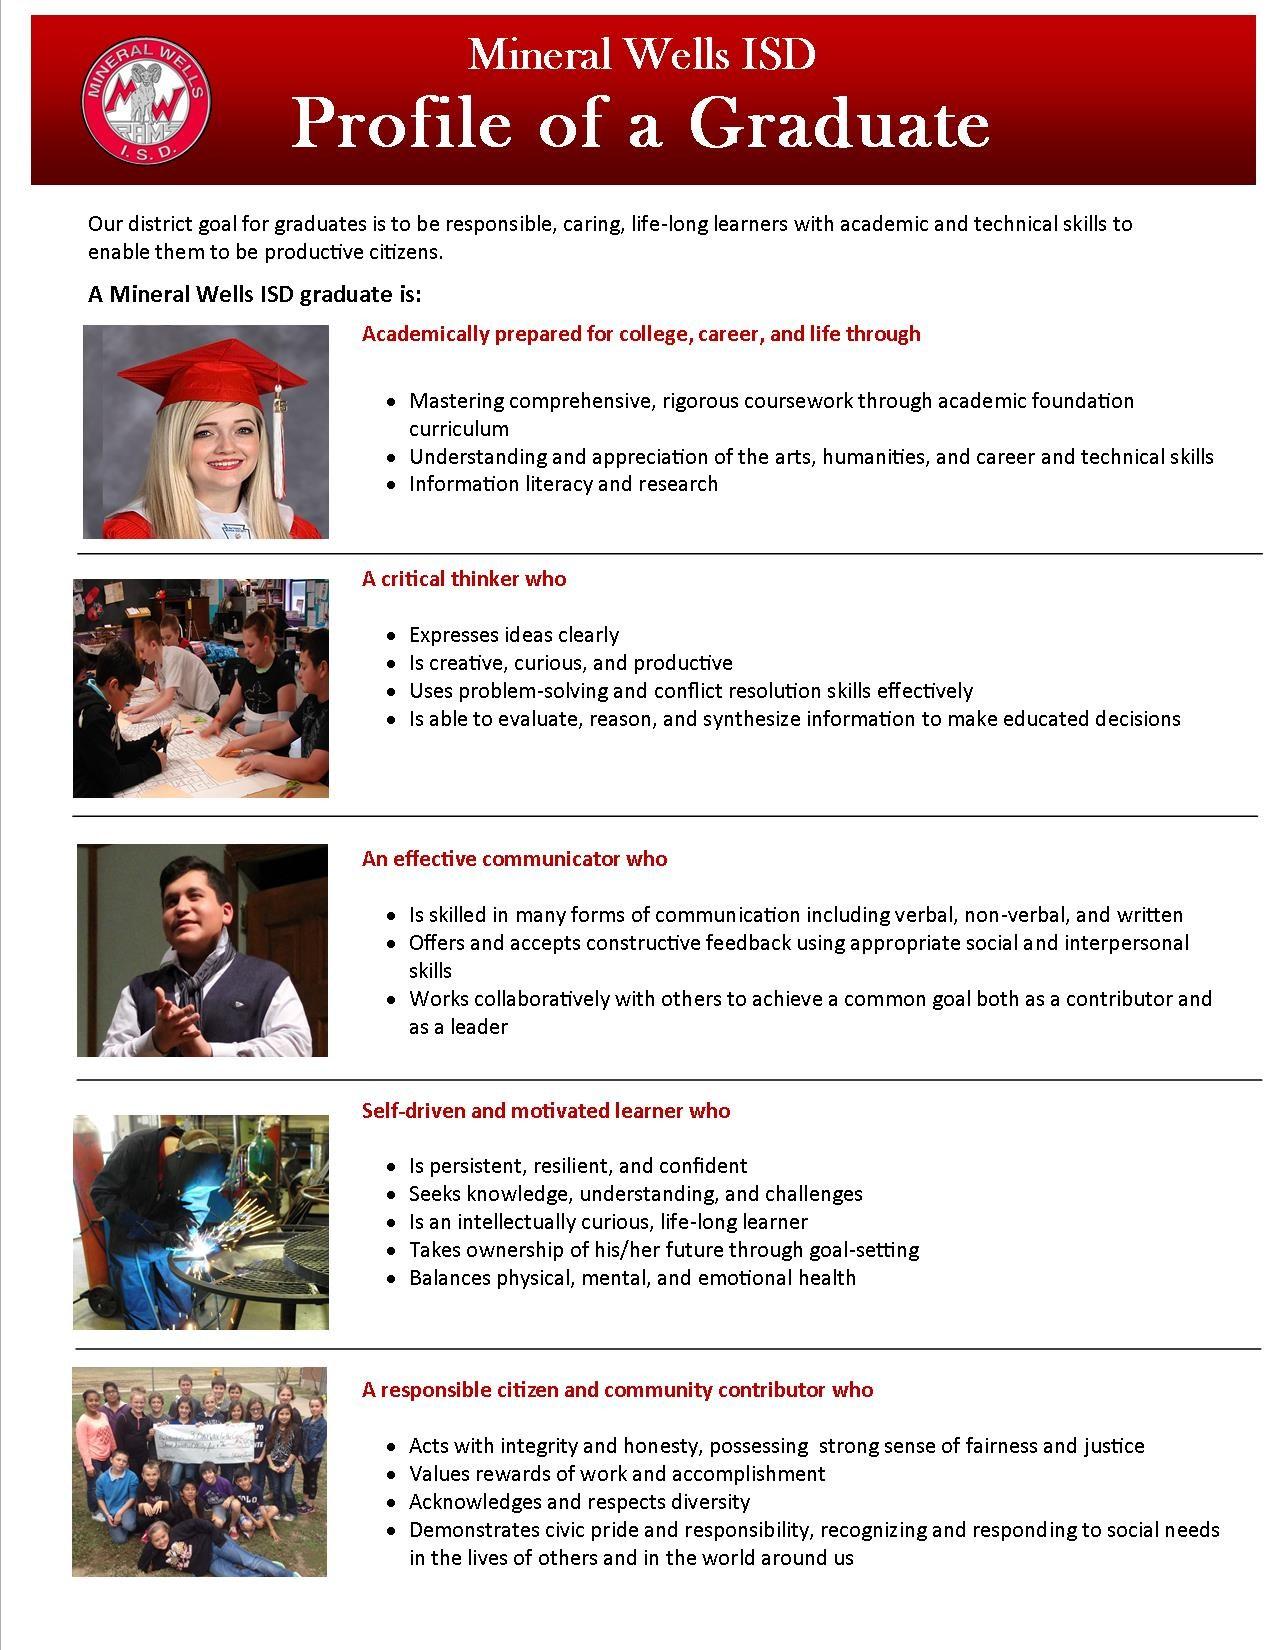 Profile of a MWISD Graduate Description